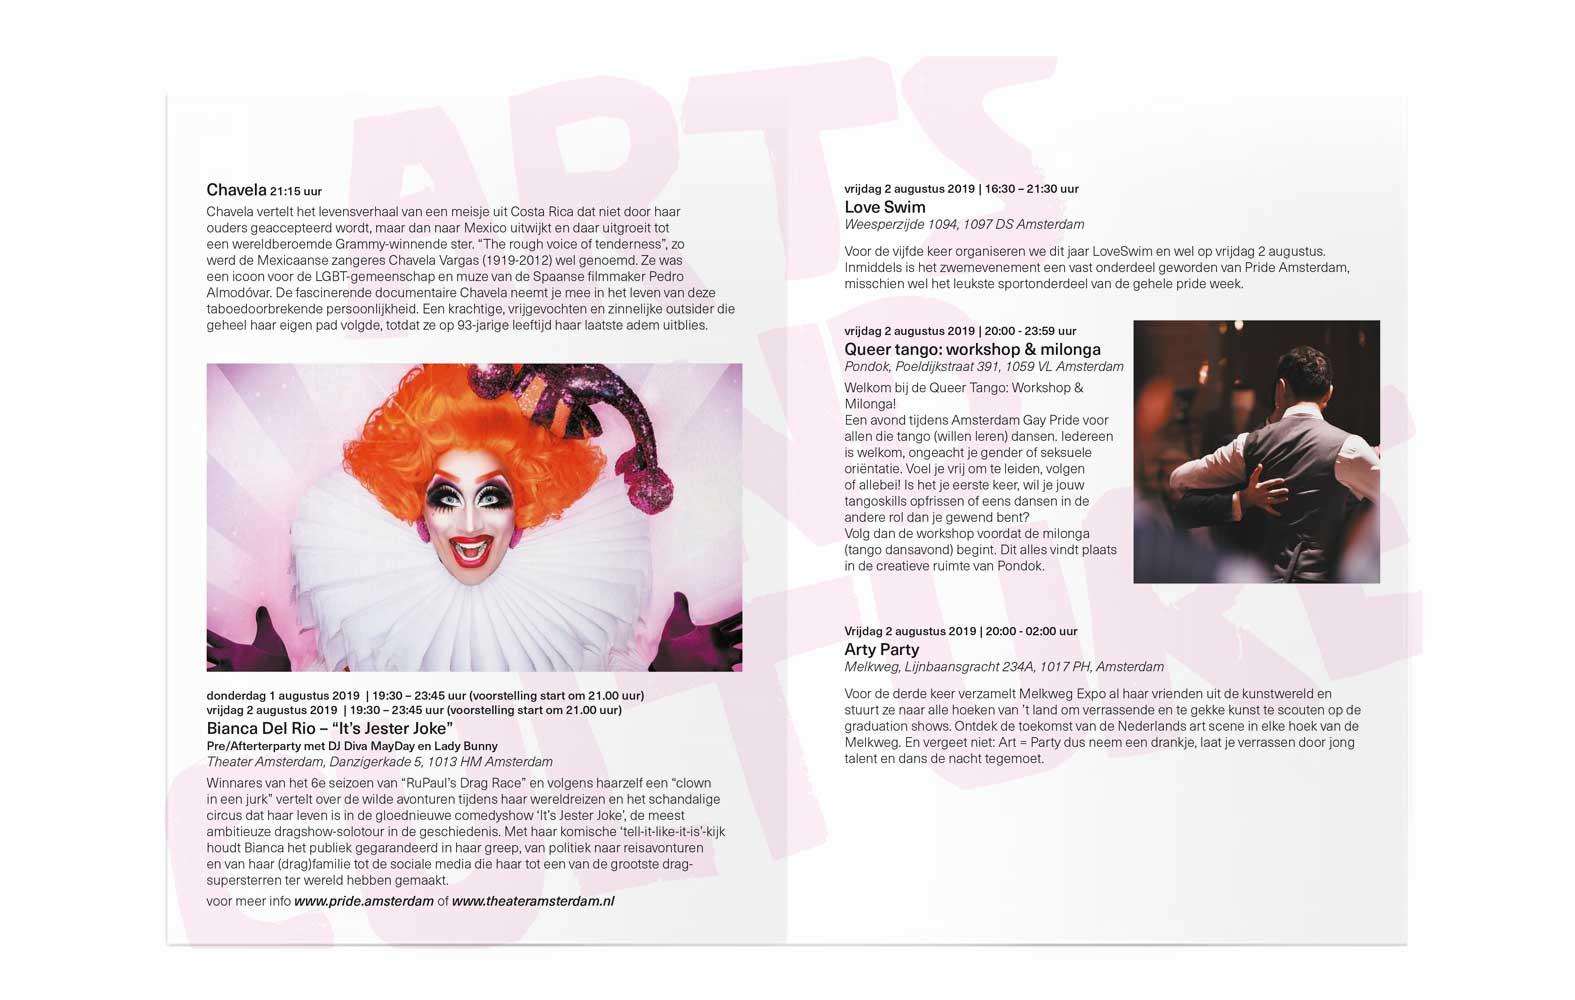 StudioErnst-Arts&CulturePride-Highlights-2019-5